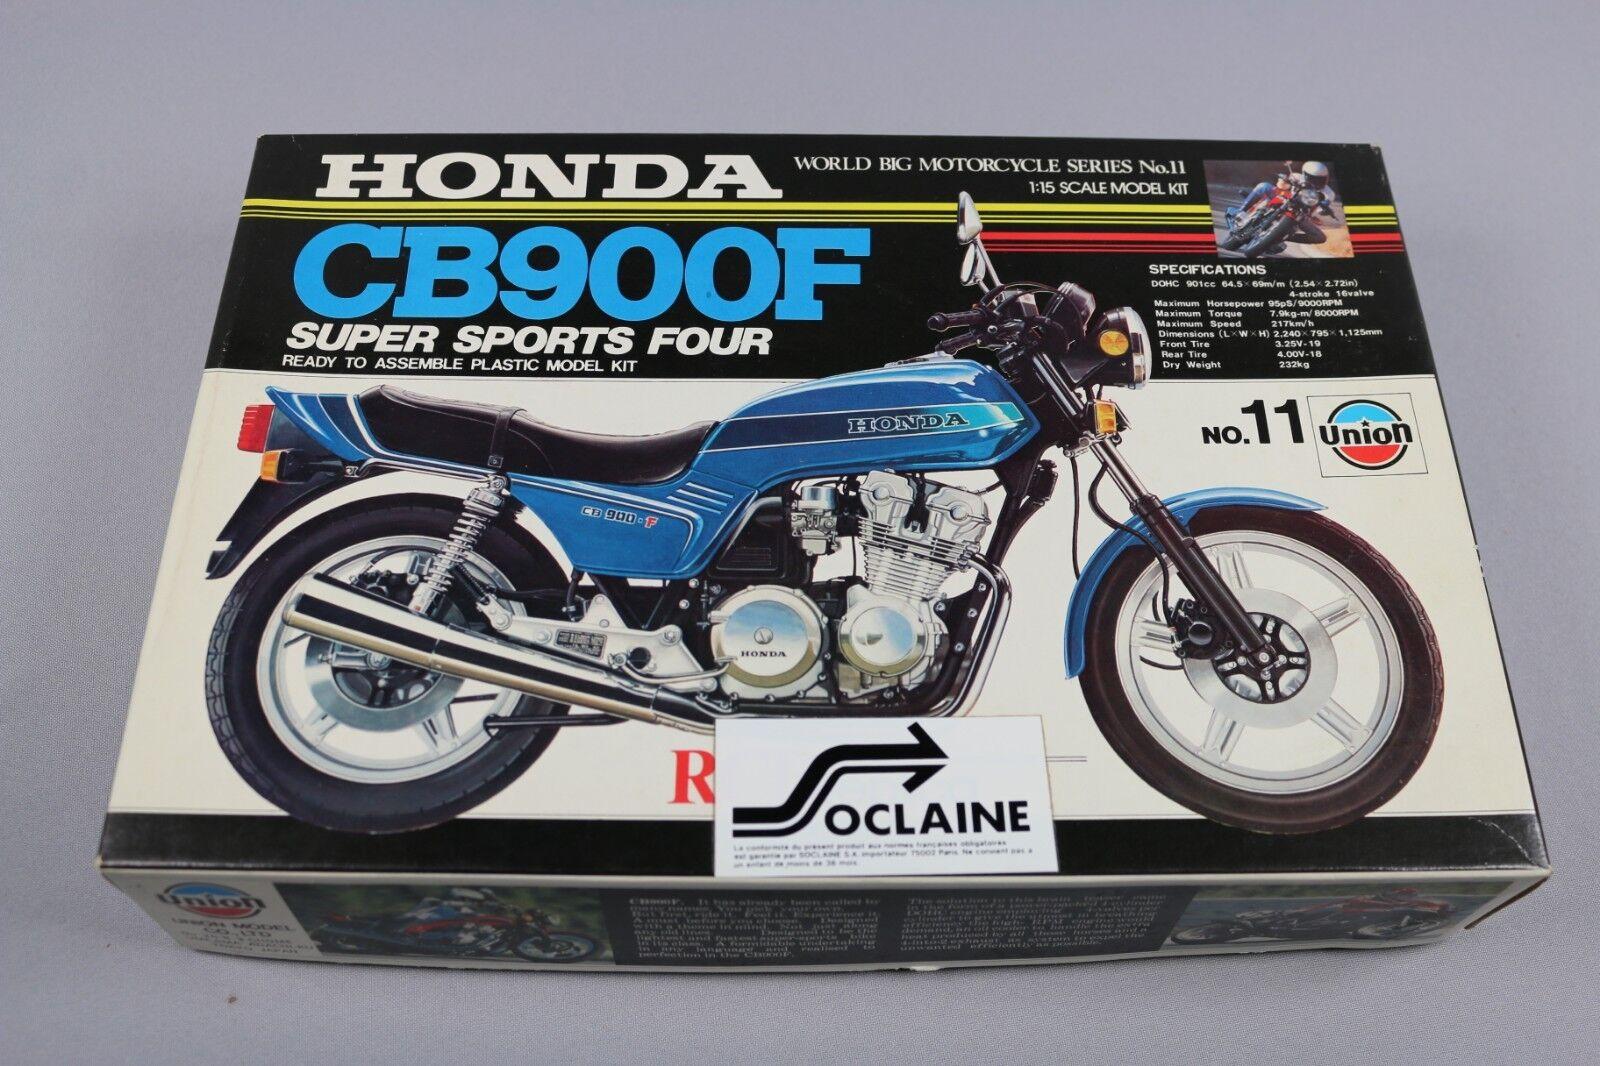 Zf1009 Union 1 15 Model M-11  700 Honda Cb900f Super Sport Four Motorcycle Jeans